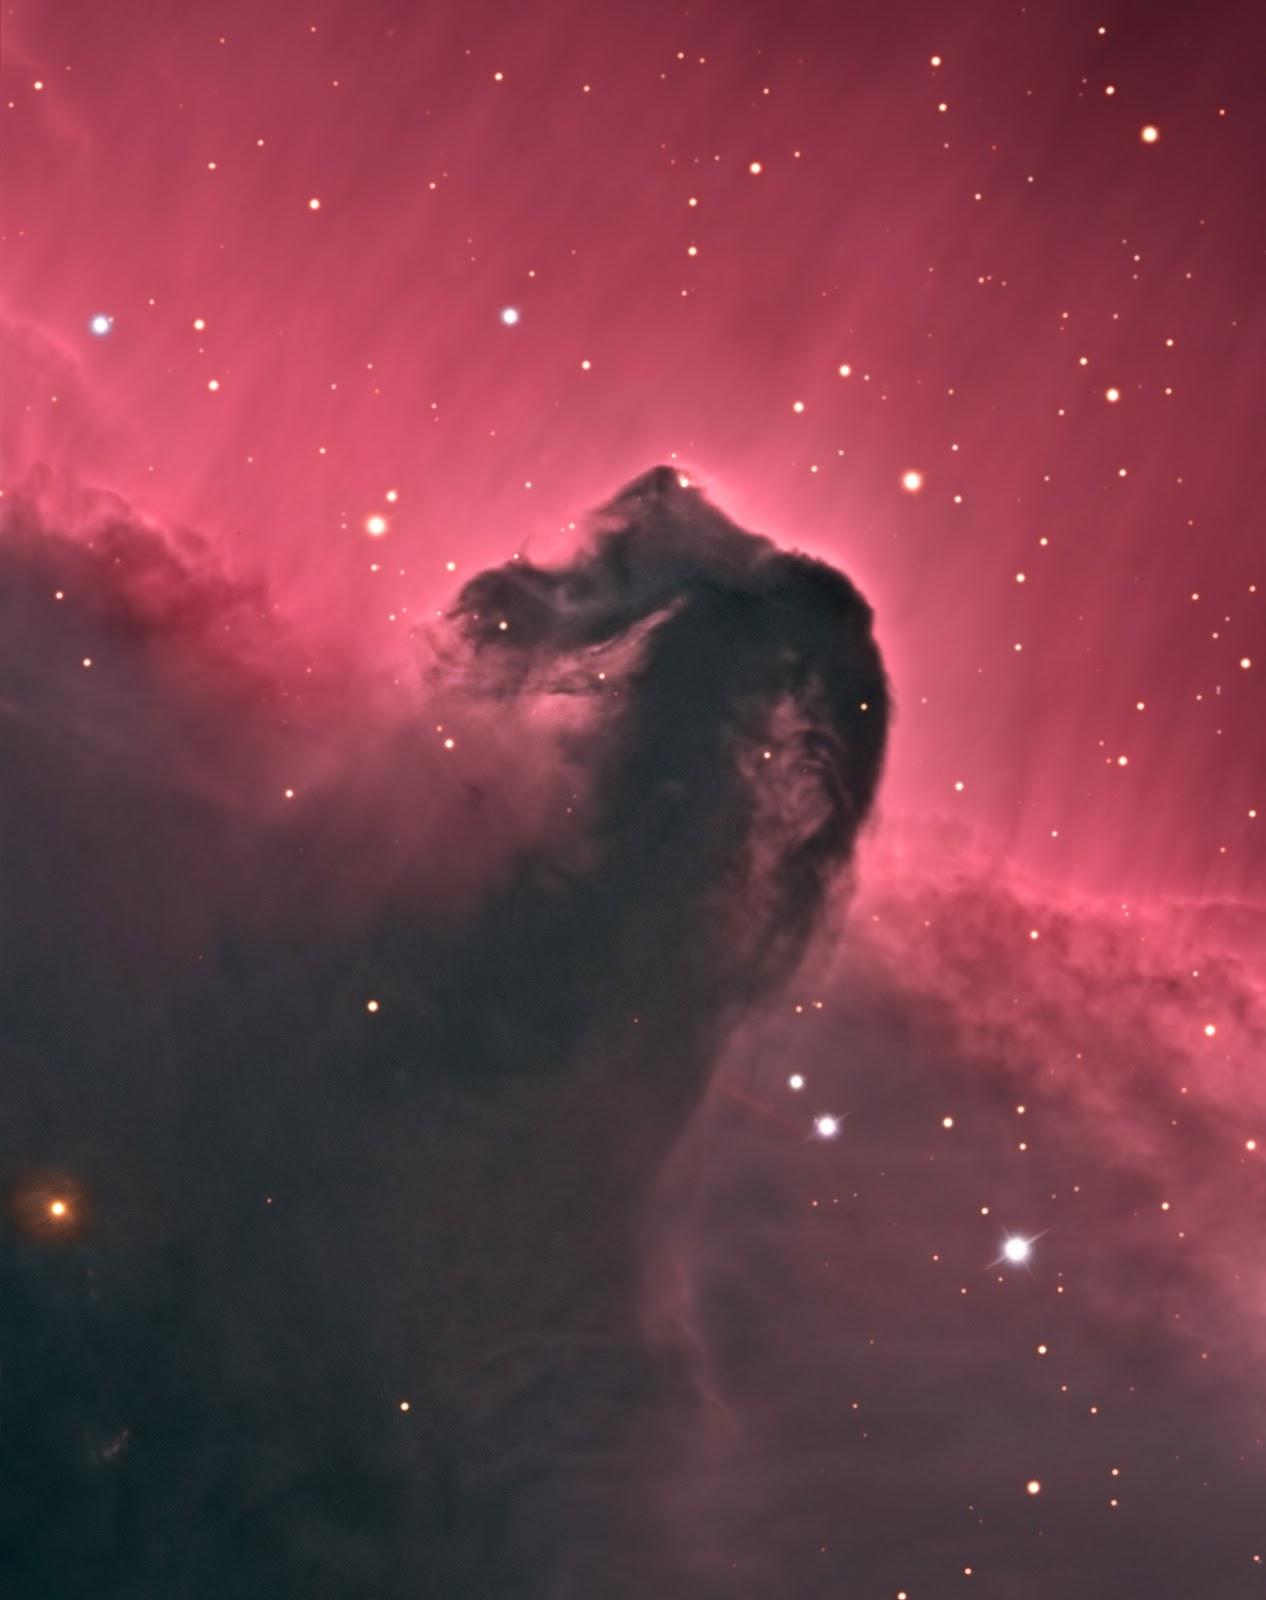 horsehead nebula jesus - photo #20